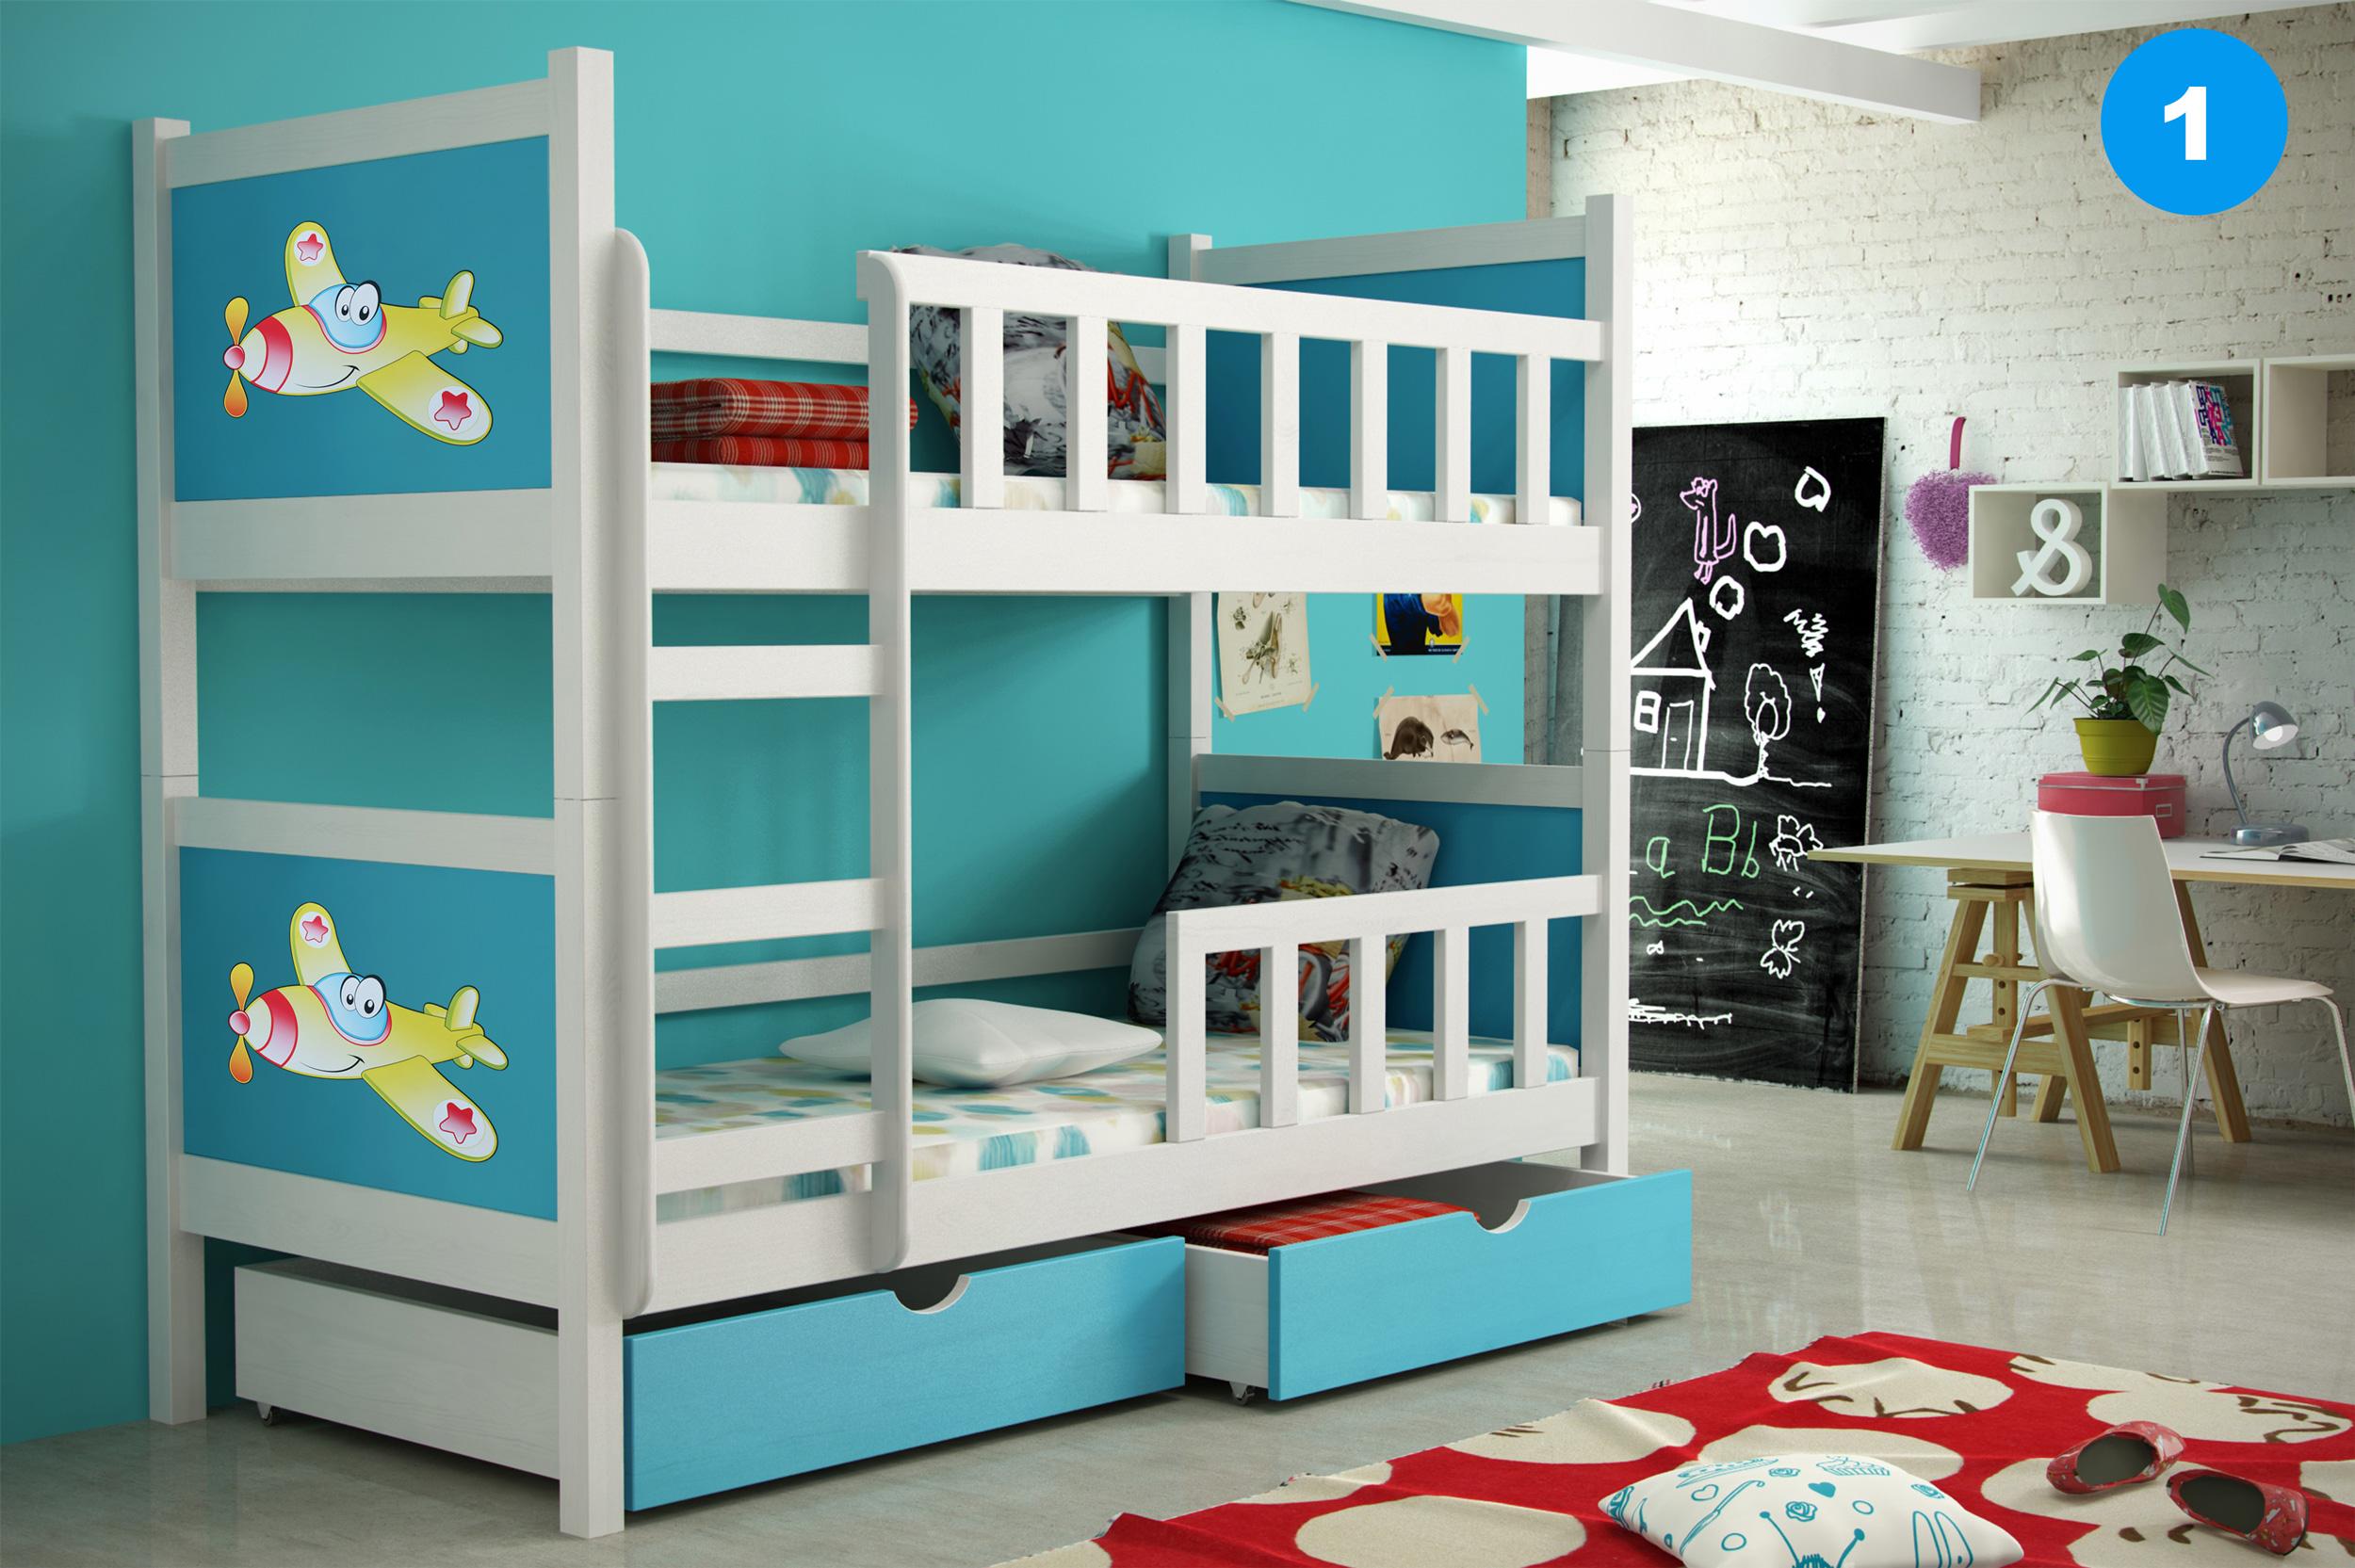 Etagenbett Abc : Etagenbett abc geneigte leiter meubles